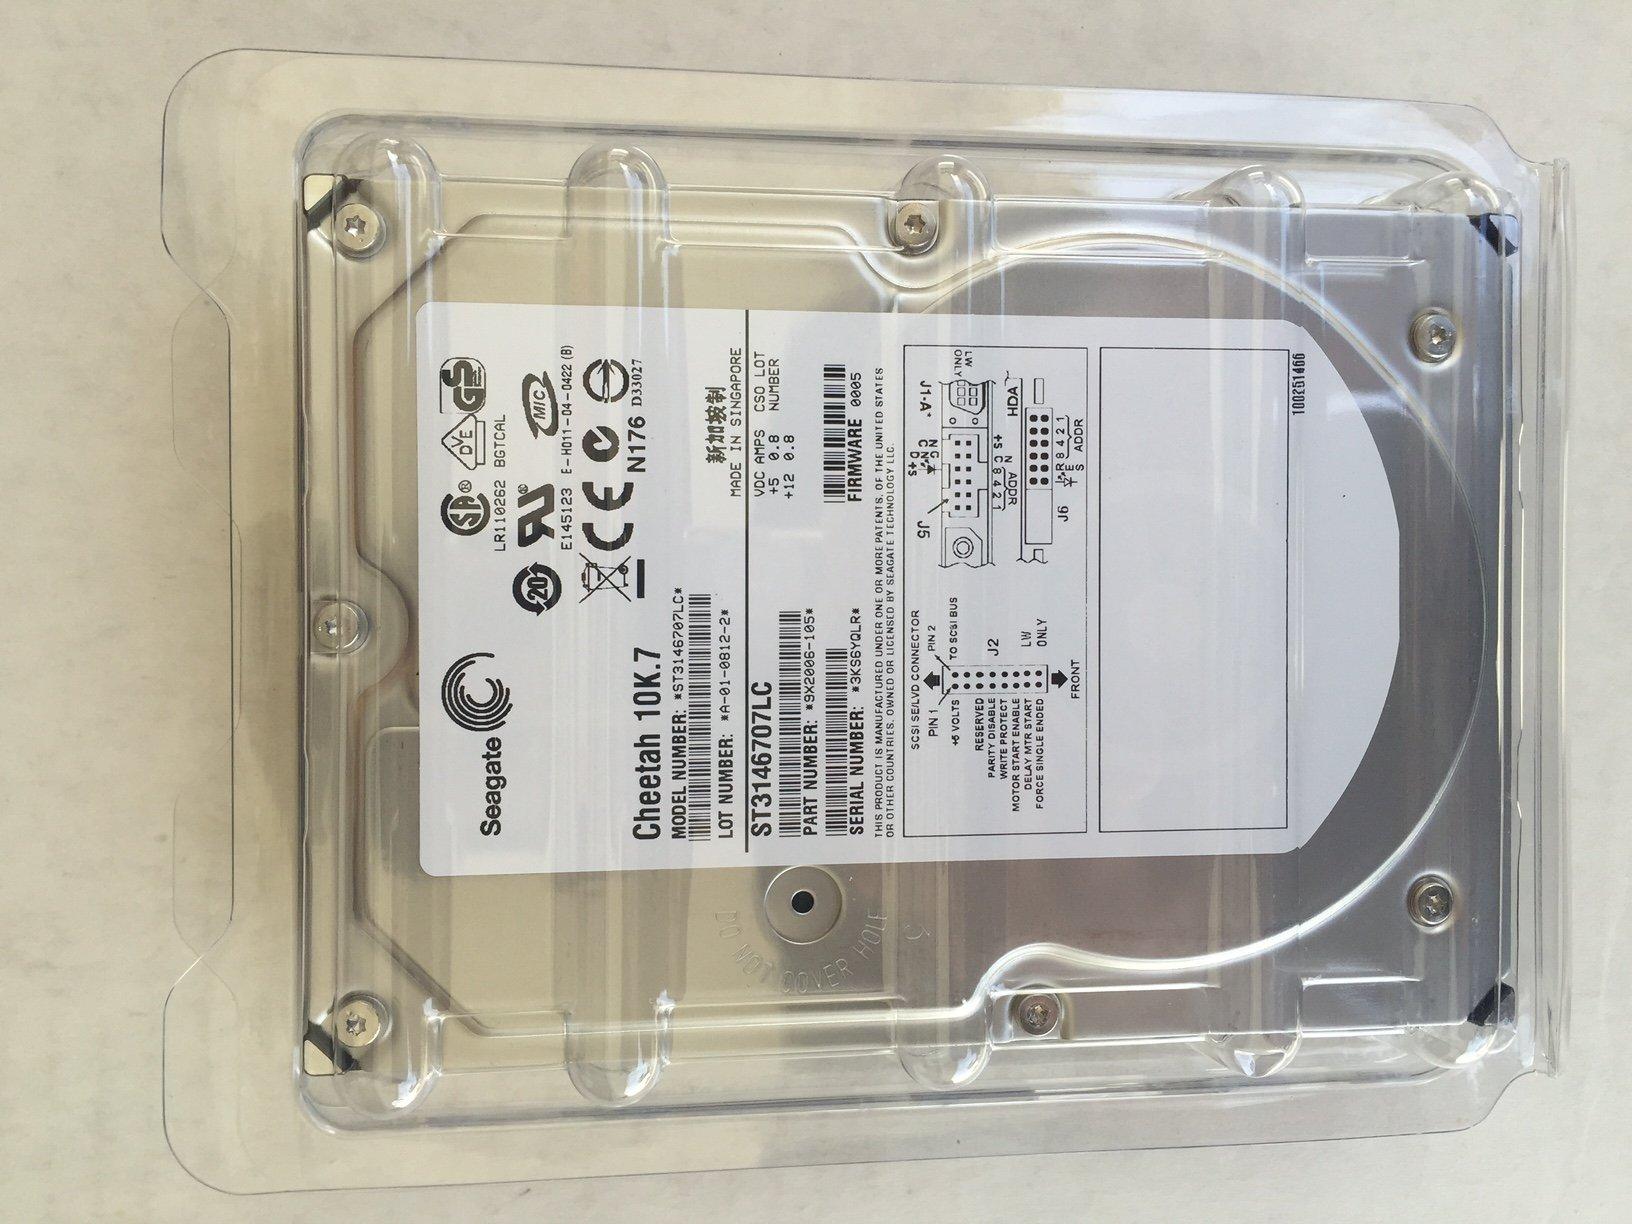 Seagate 73.4GB 15K RPM Ultra320 Mfg # ST373454LC